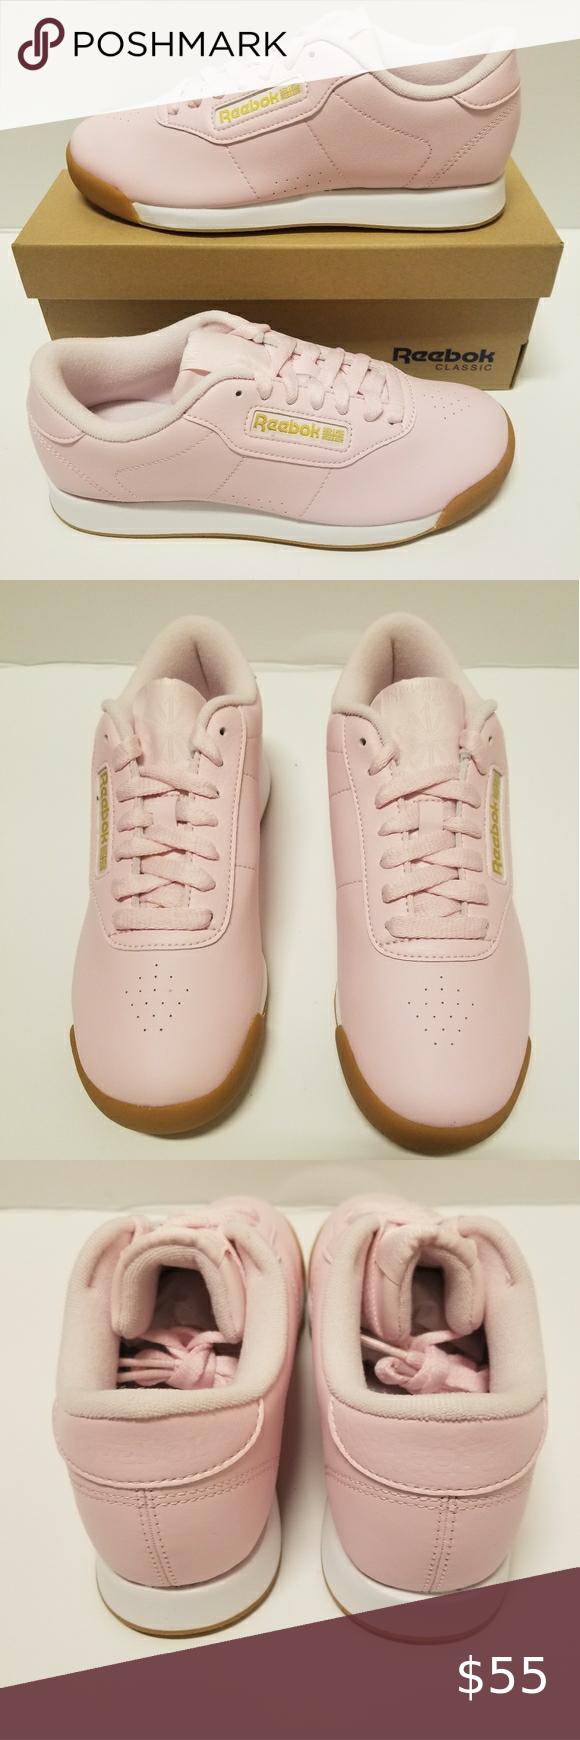 pink Reebok Classic Princess Size 6.5